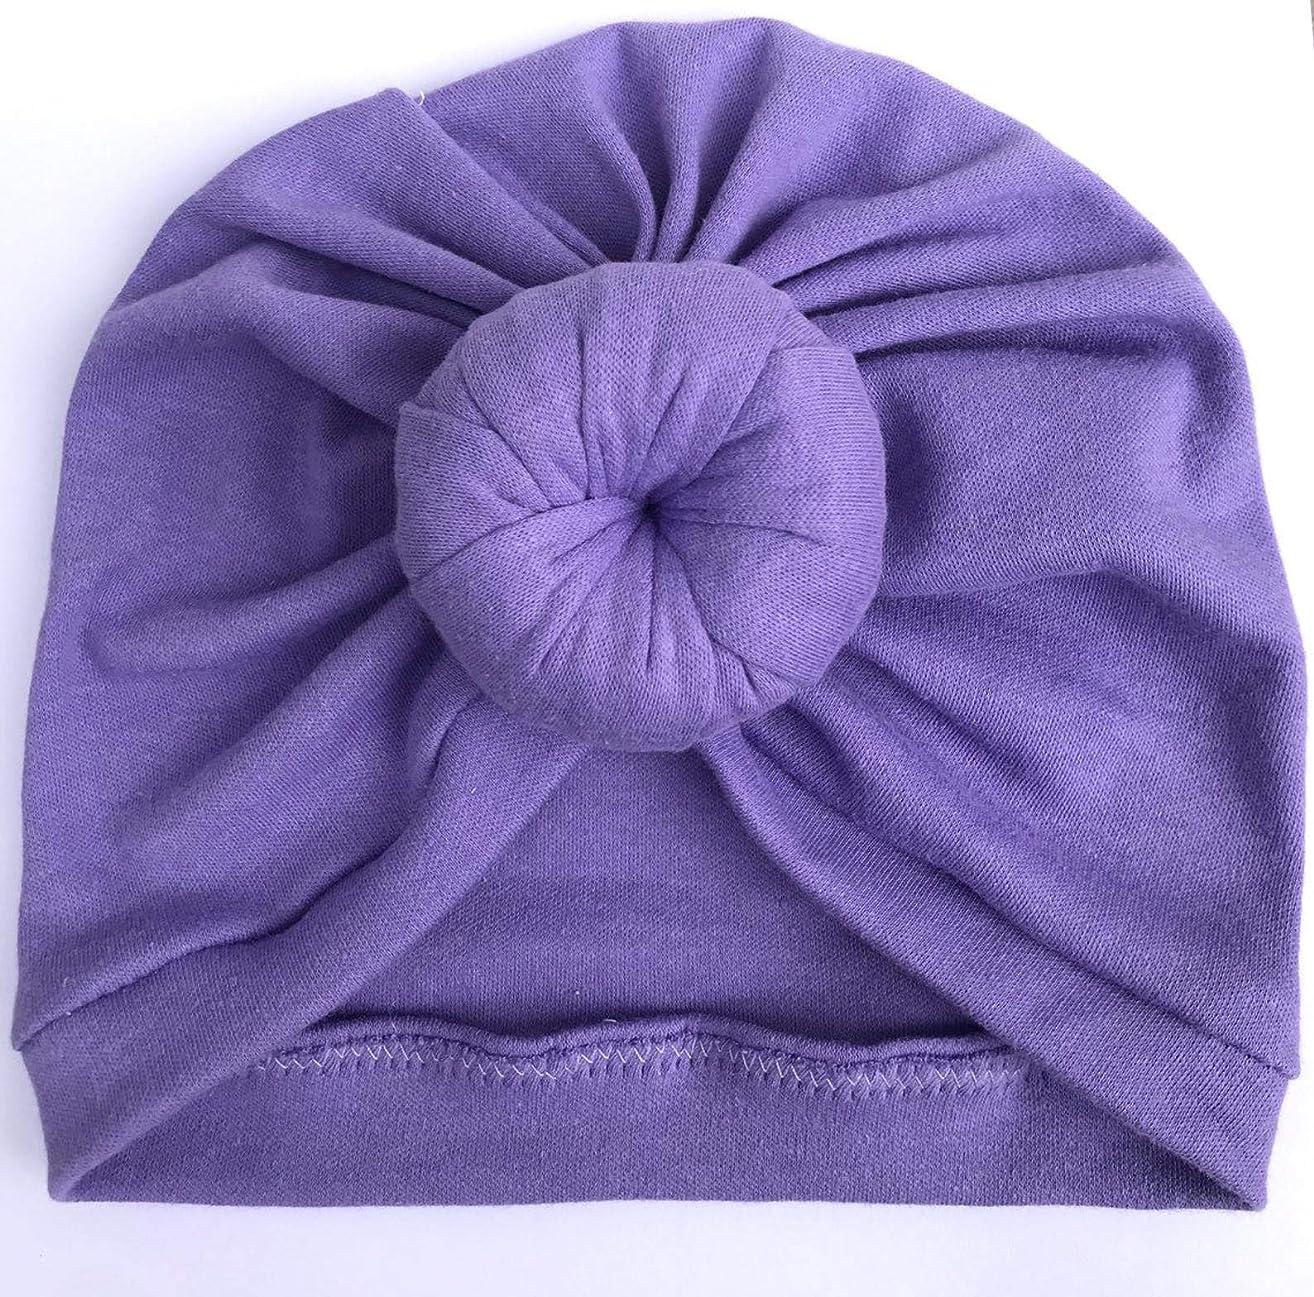 Baby Turban Lavender |Baby Turban|Adult Turban|Top Knot Turban|Top Knot Baby Hat|Kids Turbans|Toddler Turban|Newborn Turban